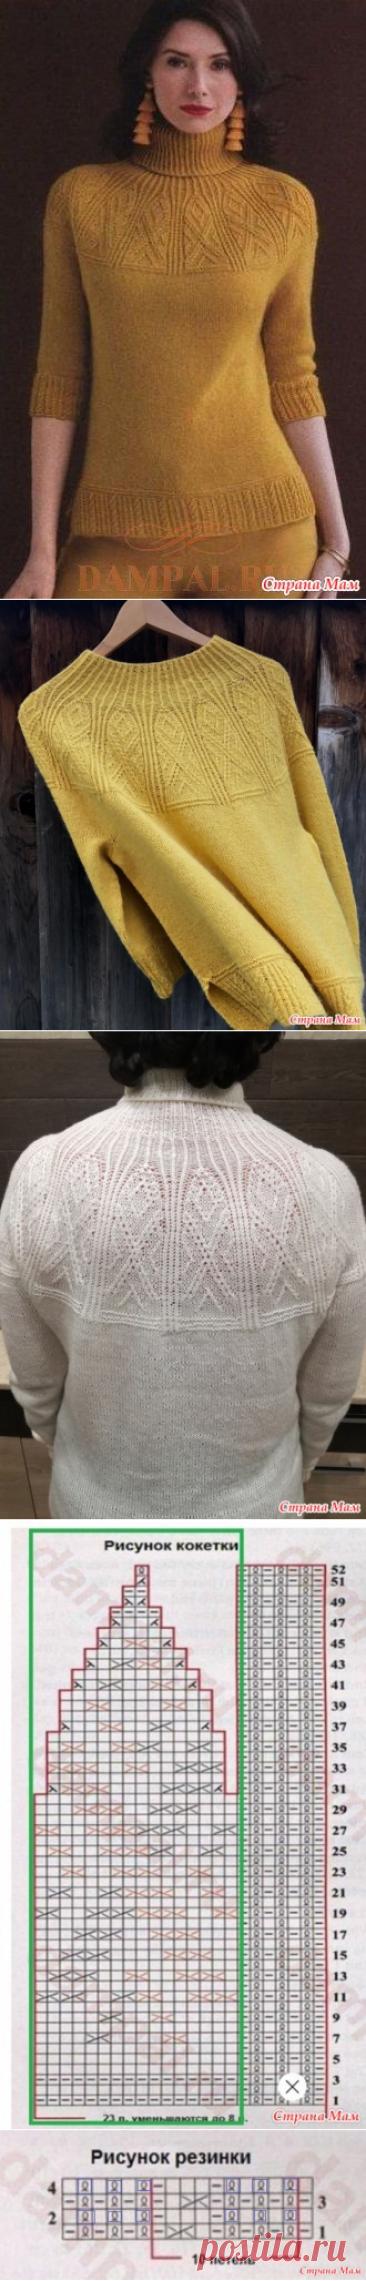 Совместник по вязанию свитера «Crown Jewels» Стартуем!!! - Страна Мам